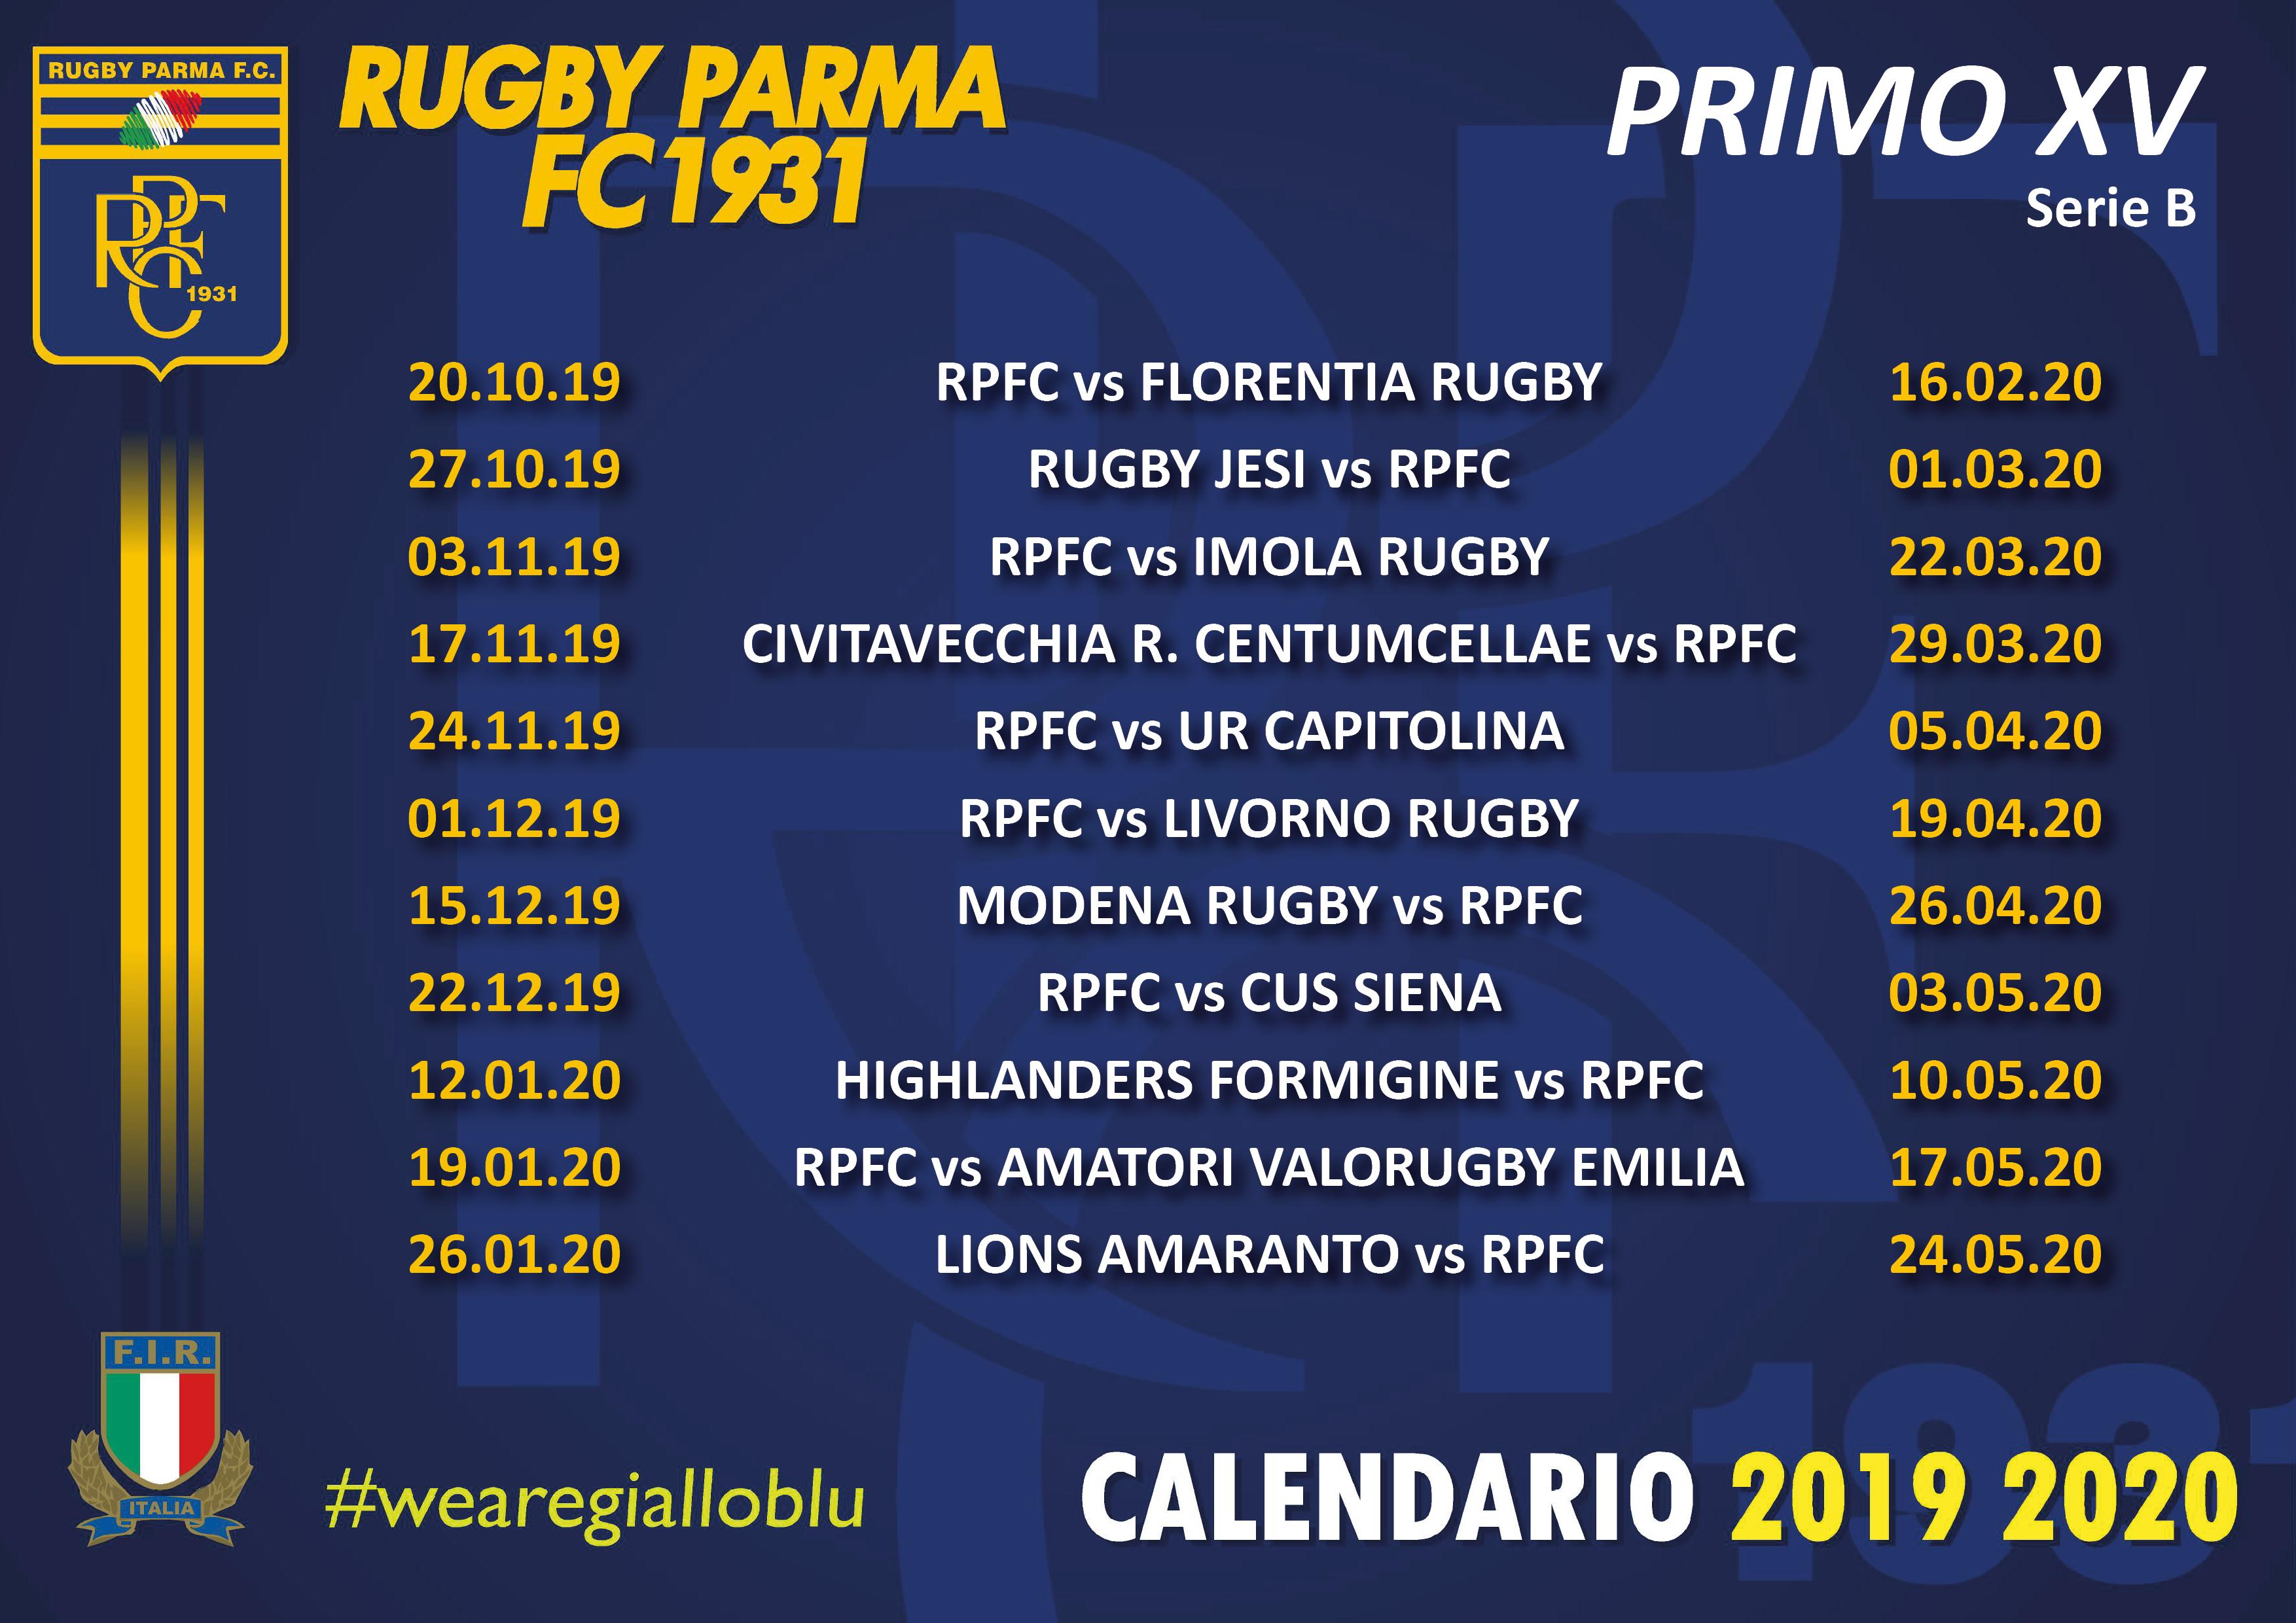 Calendario Tornei Minirugby 2020.Calendario 1 Xv Rugby Parma